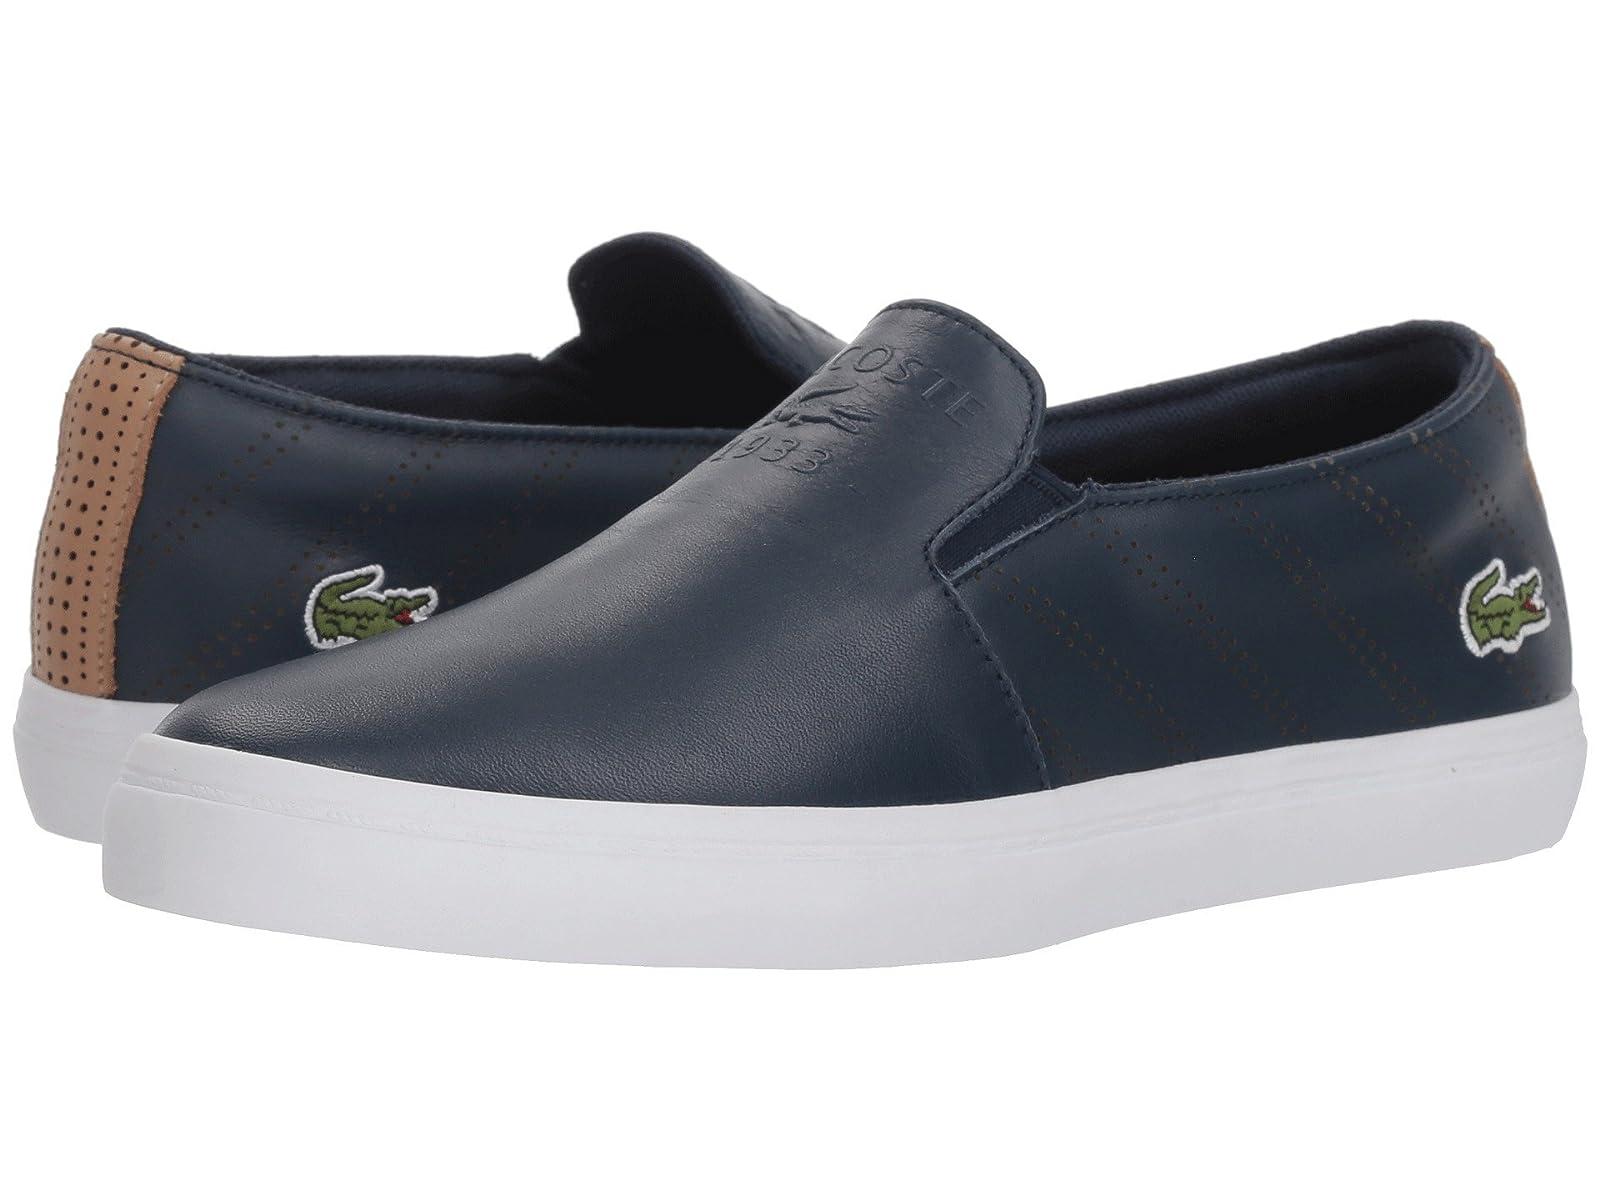 Lacoste Gazon 318 2Atmospheric grades have affordable shoes